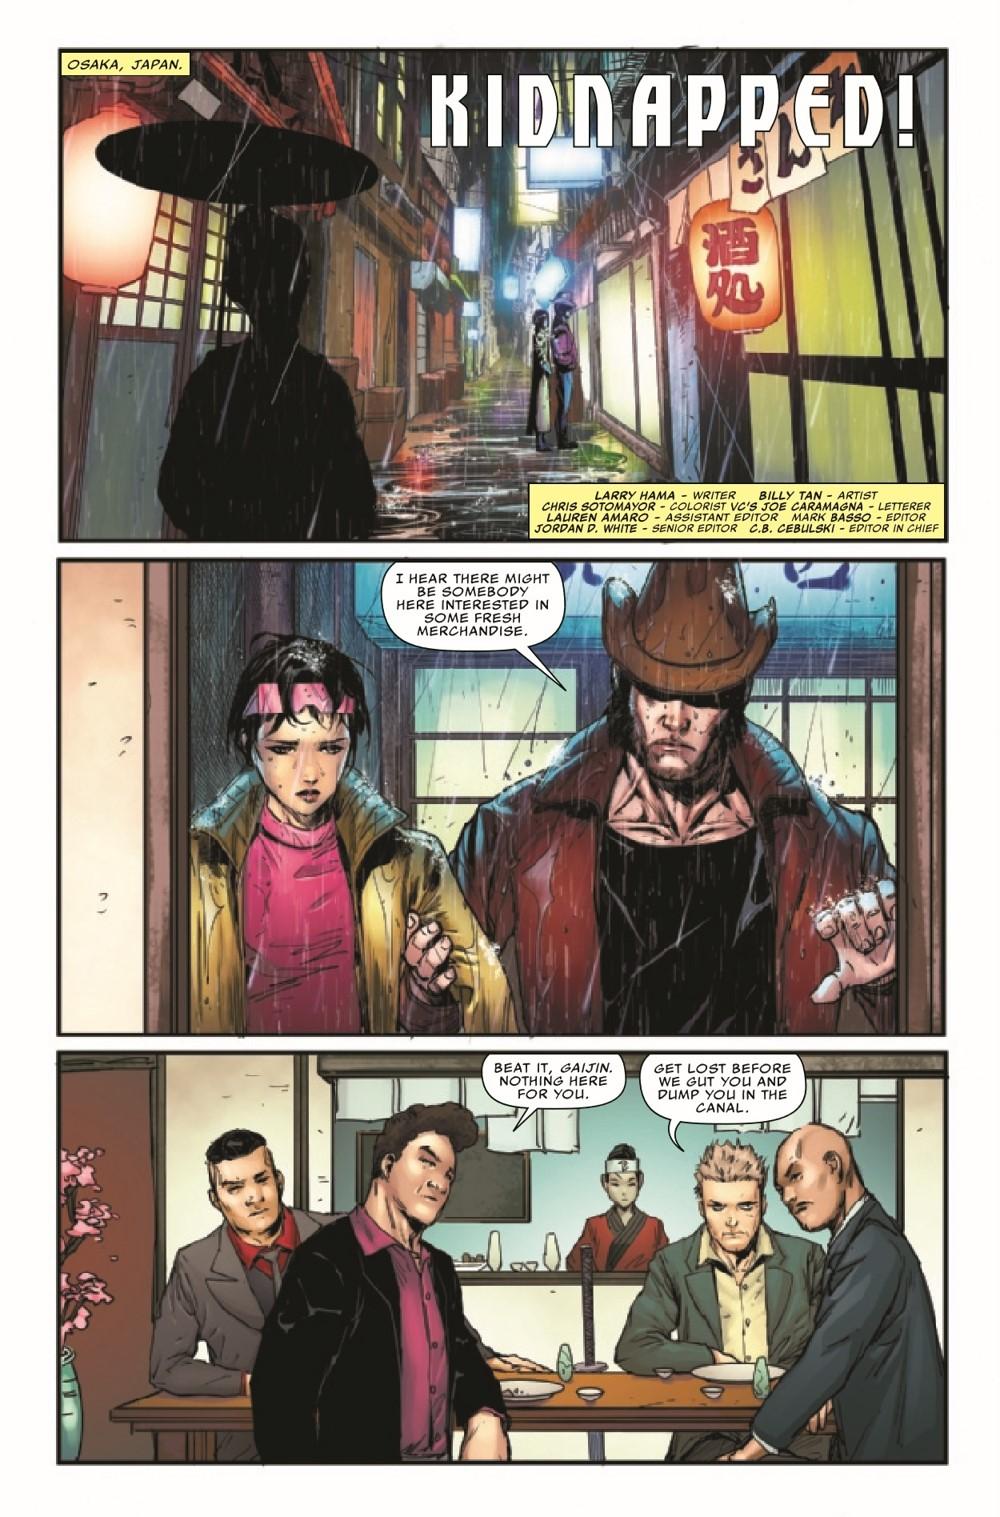 XMLEGENDS2021007_Preview-2 ComicList Previews: X-MEN LEGENDS #7